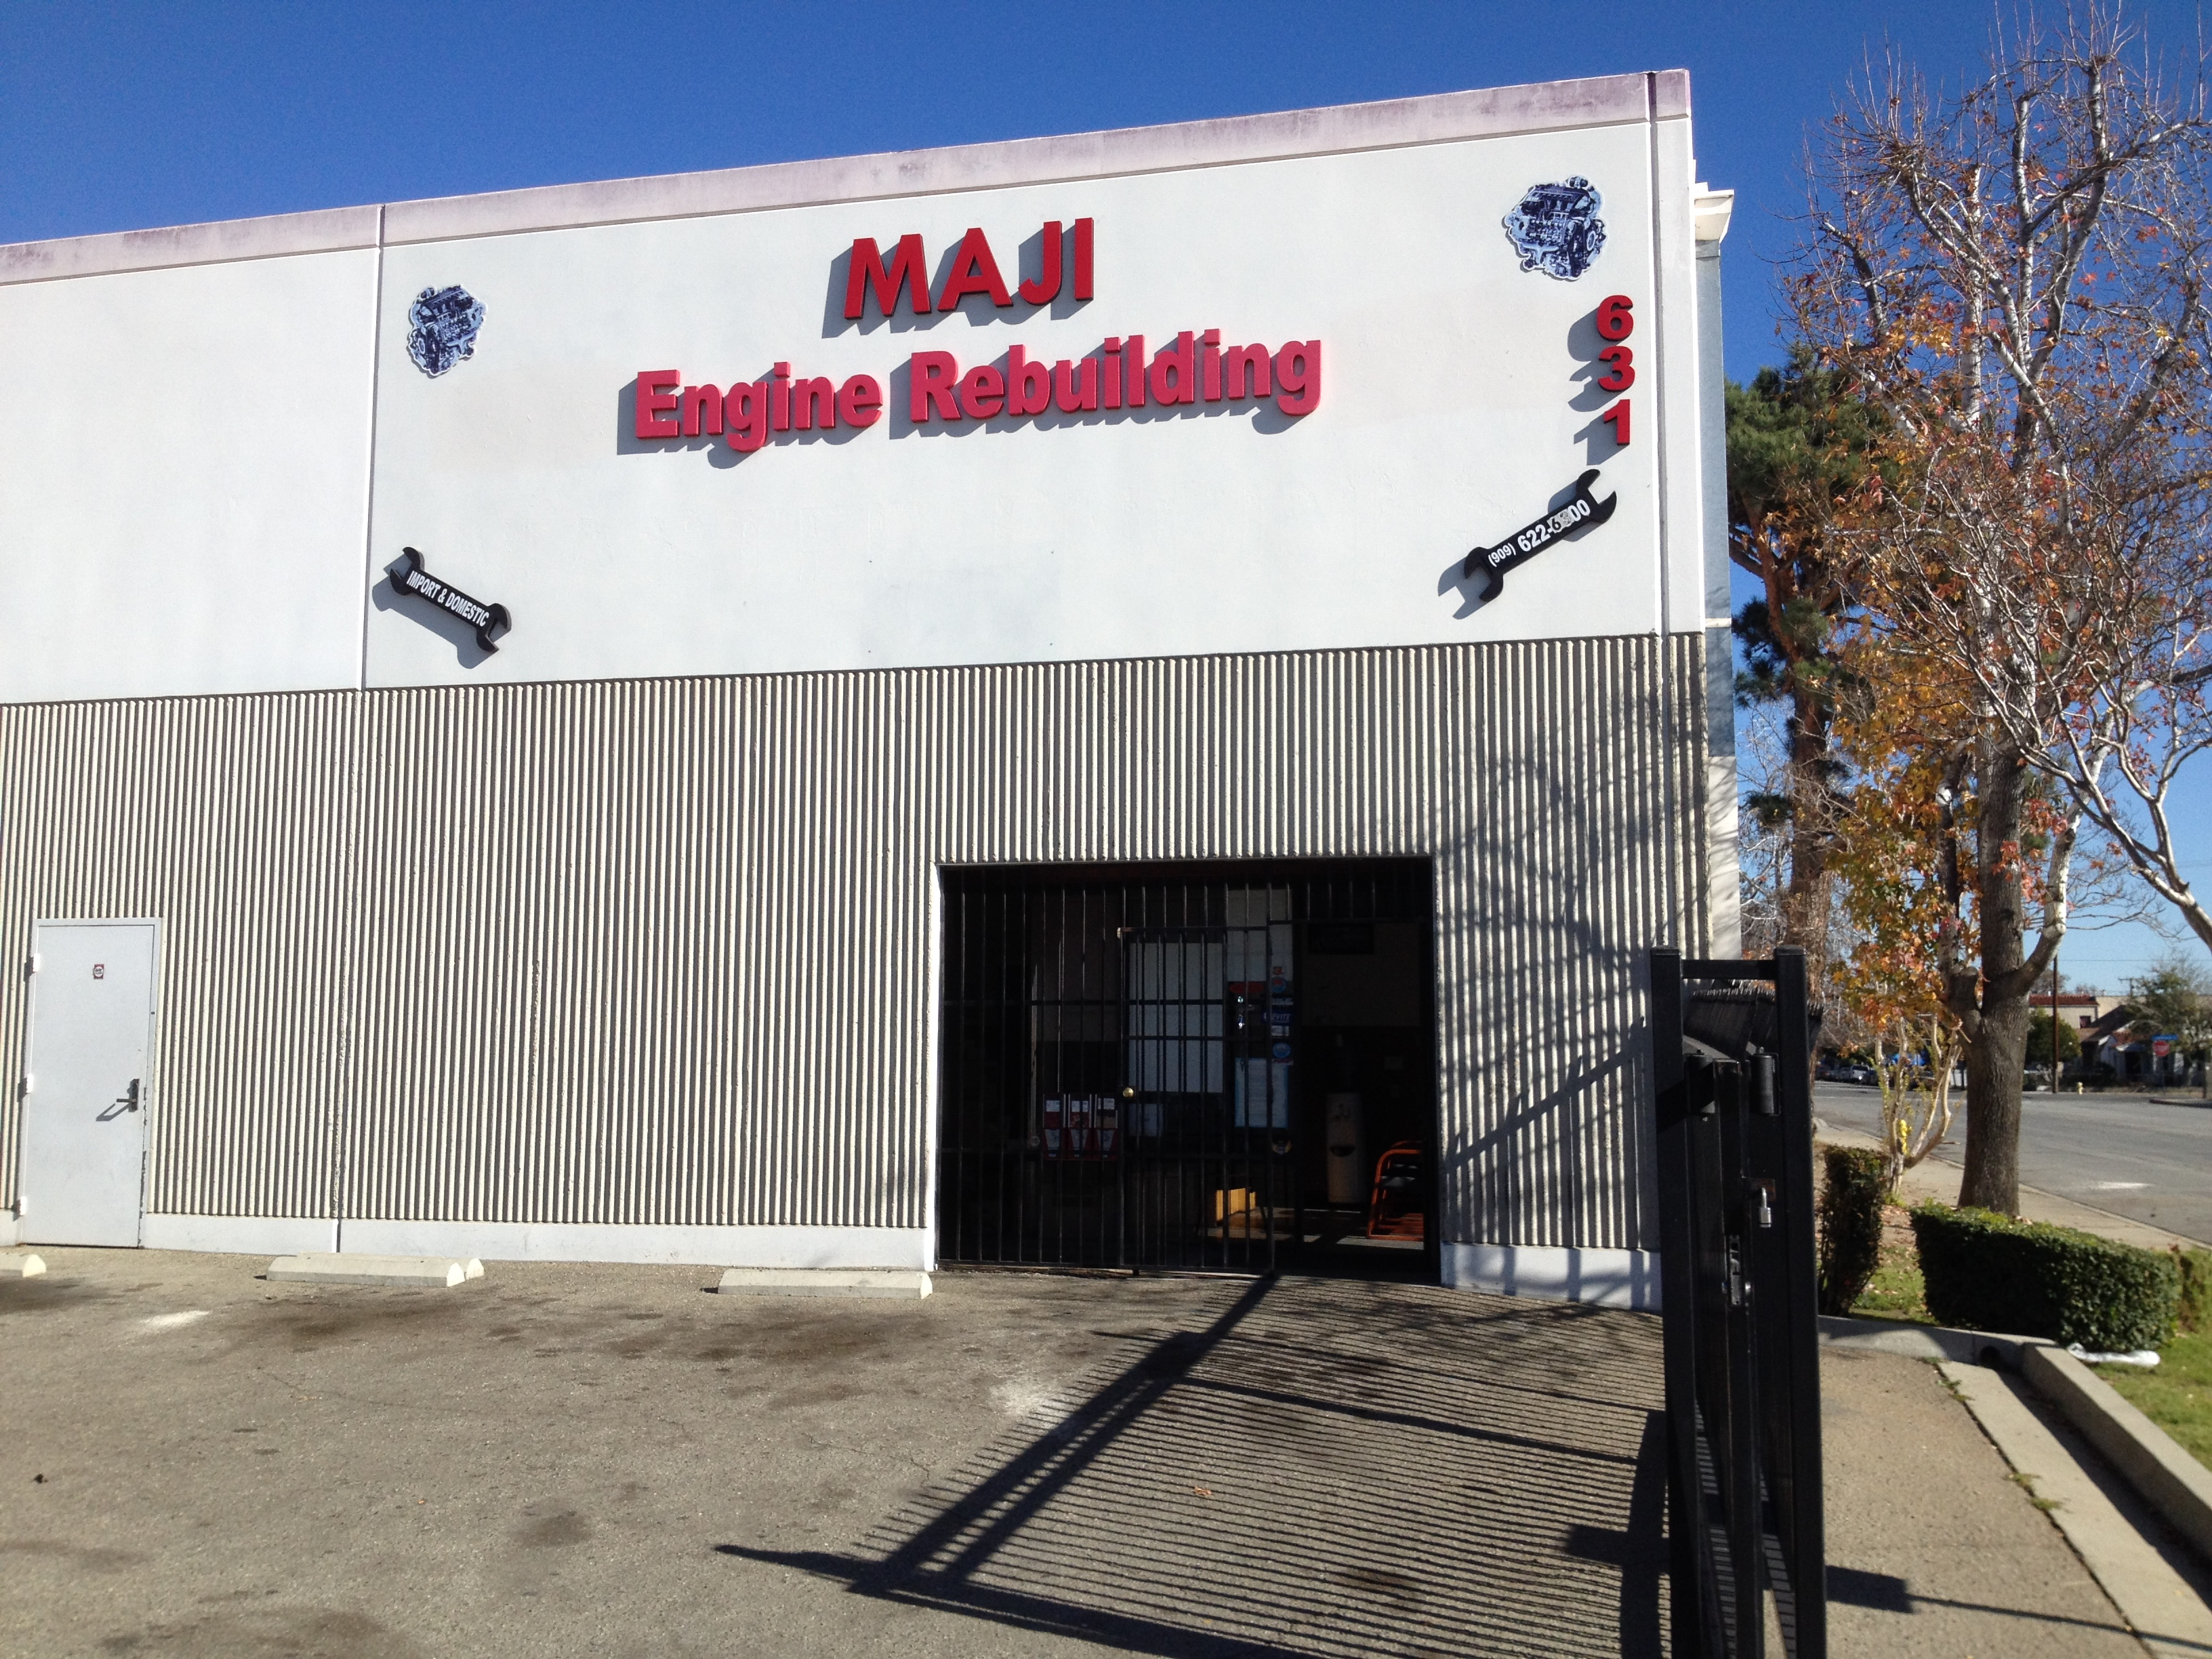 MAJI Engine Rebuilding